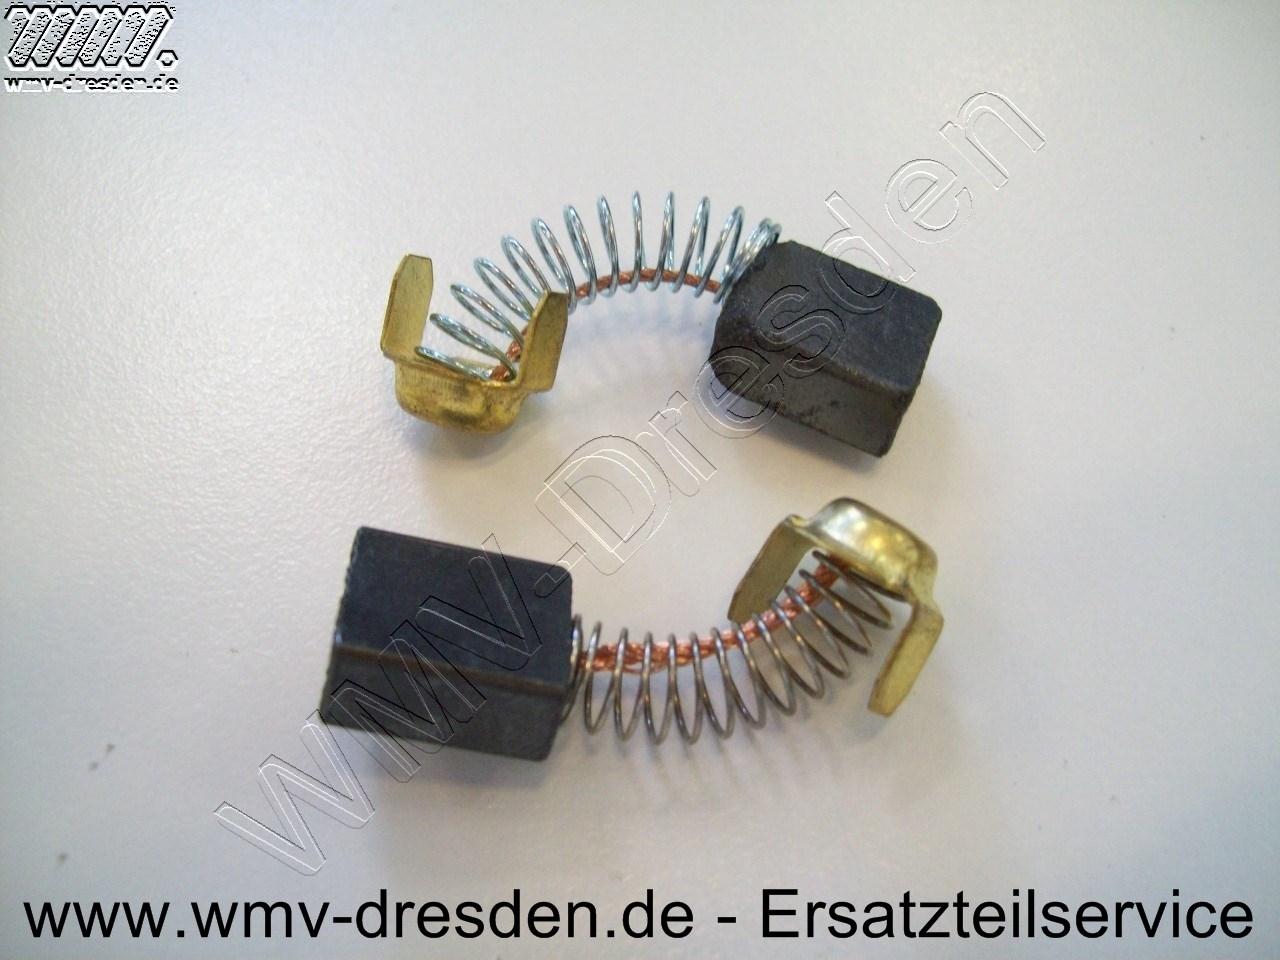 Kohlebürstenpaar alte Ausführung, bis Bj 09-2009, 13 mm breit, 6,9 mm dick, 14,5 mm lang, passend zu Bürstenkappe Ø15 mm